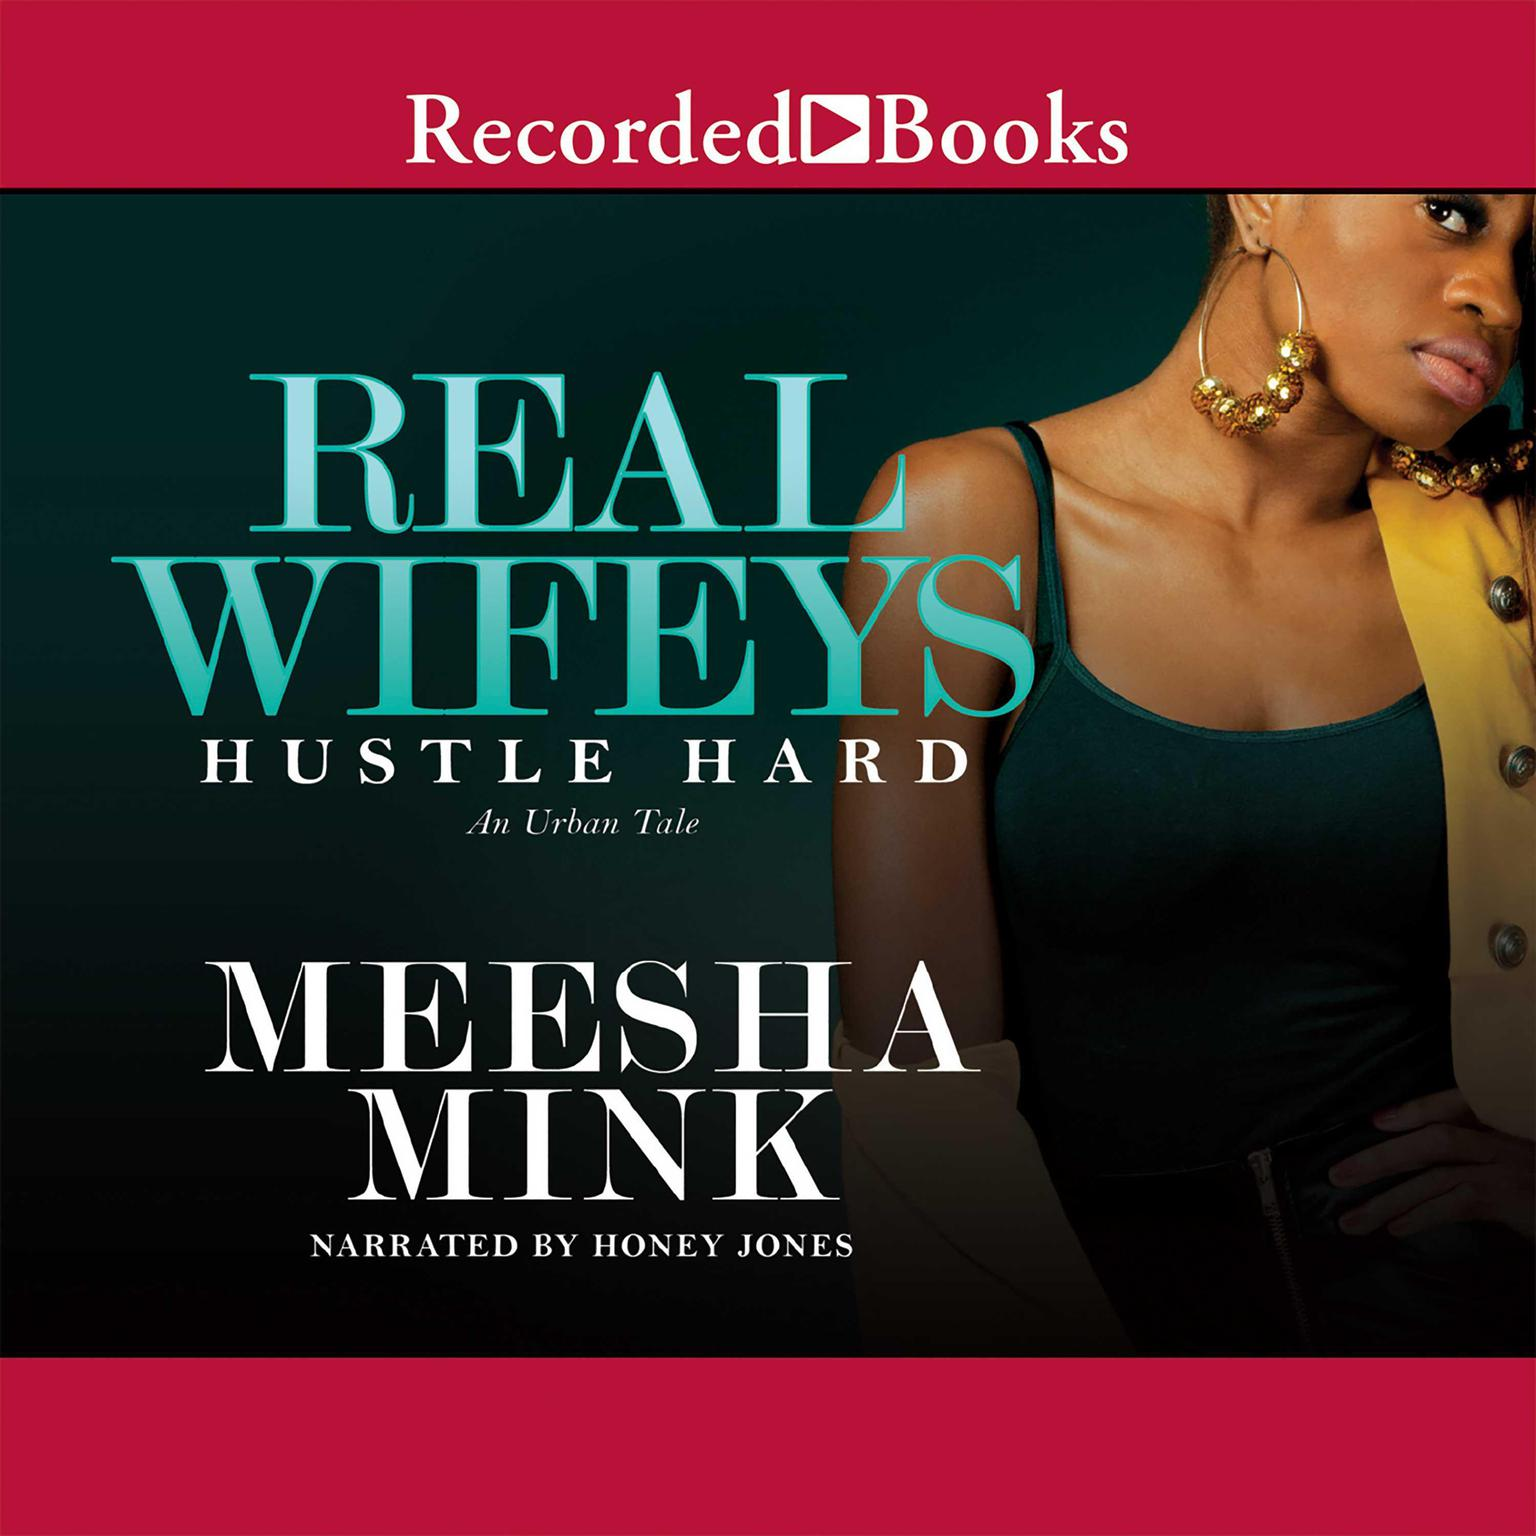 Real Wifeys: Hustle Hard Audiobook, by Meesha Mink